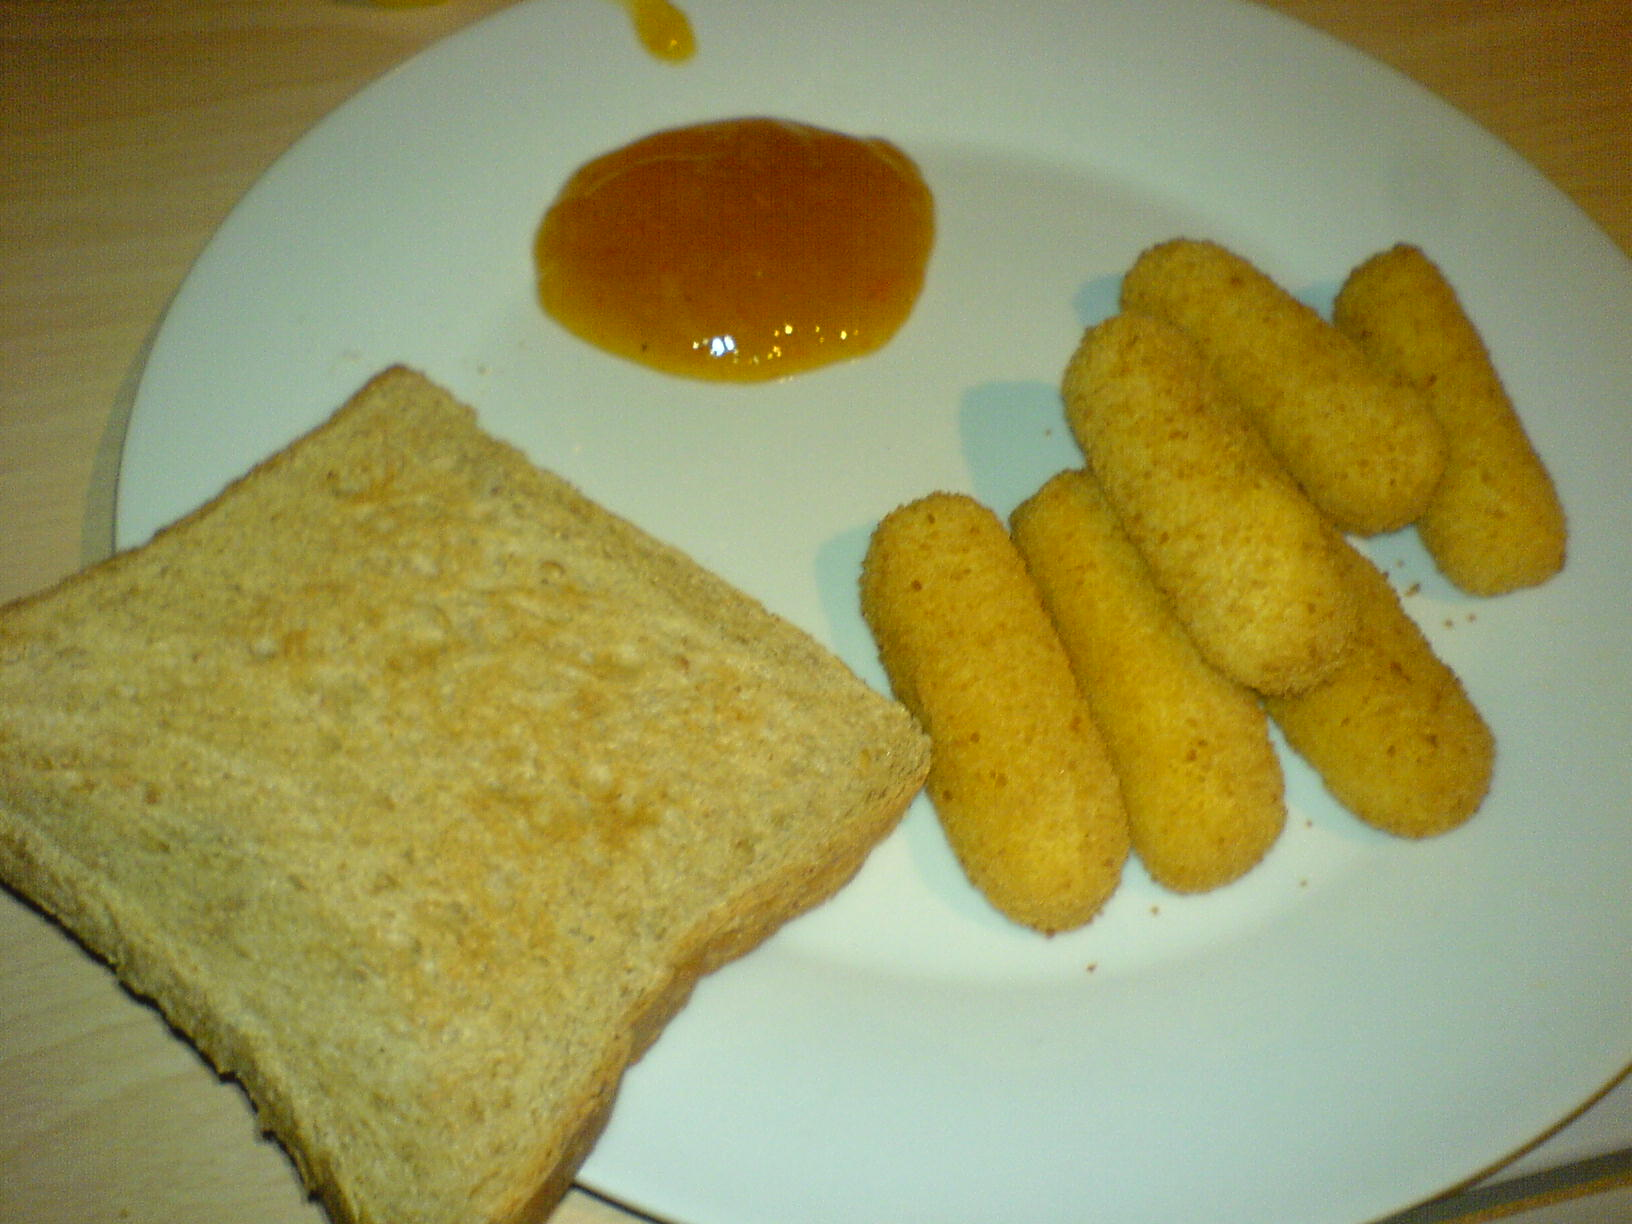 http://foodloader.net/Holz_2008-12-29_Frischkaese-Sticks_mit_Toast.jpg